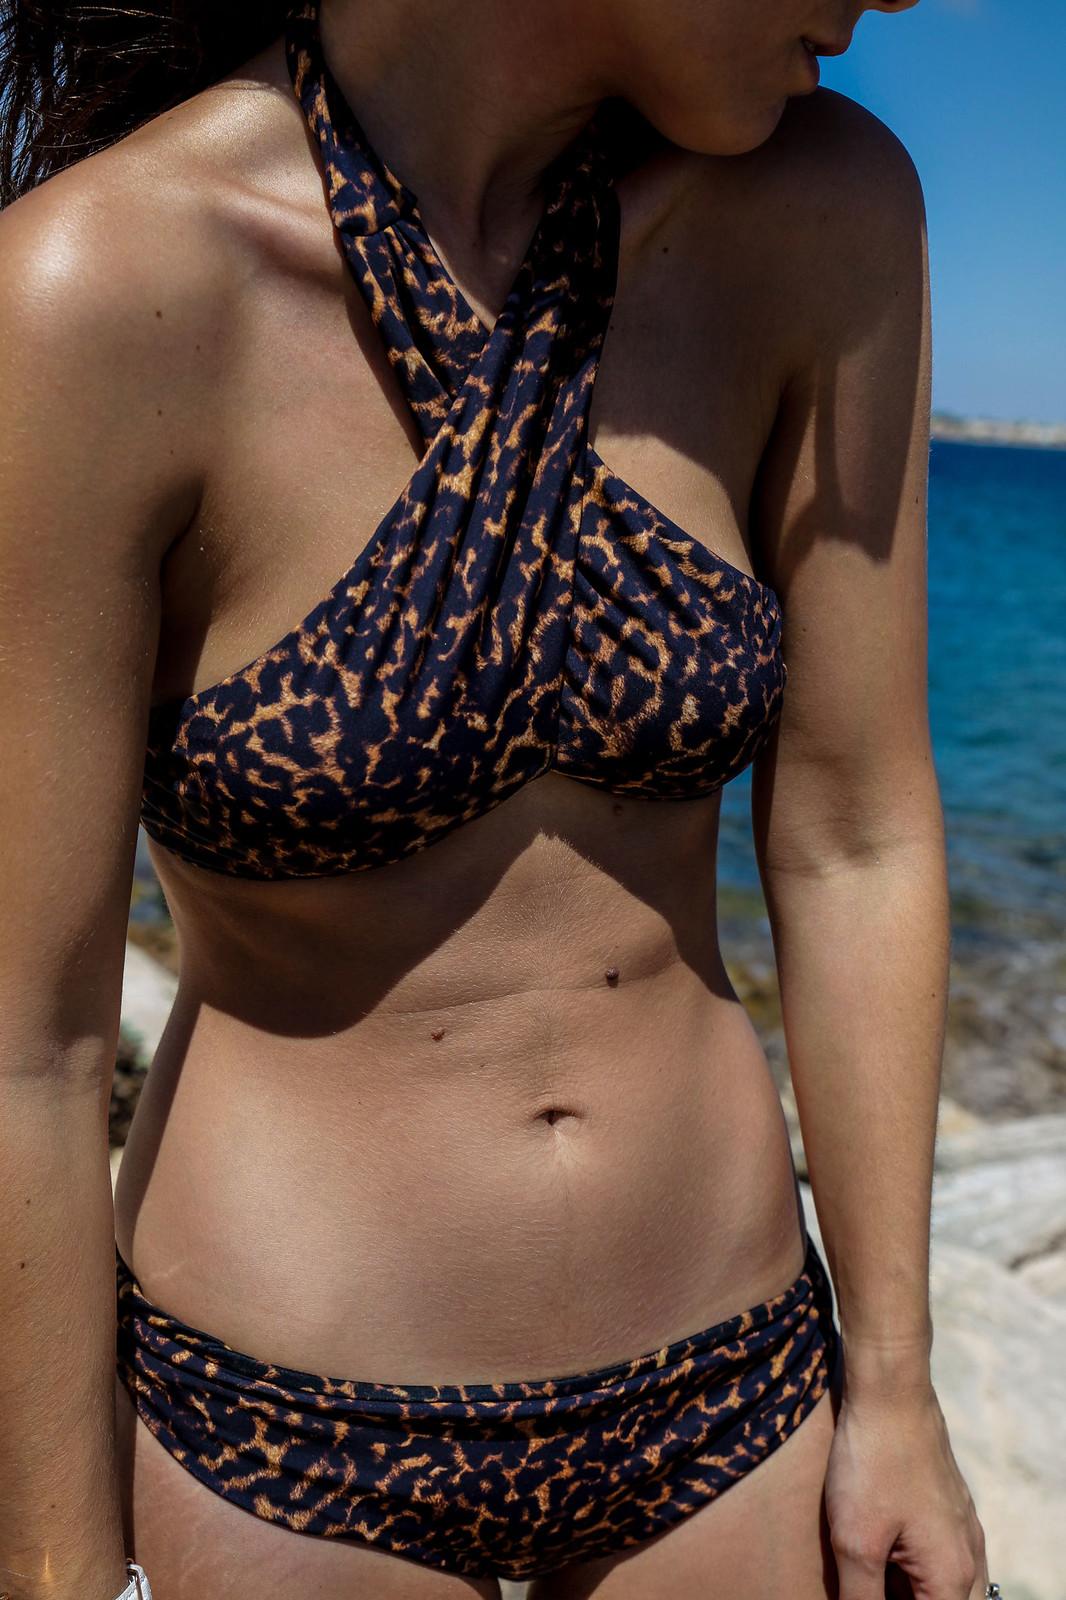 03_beachriot_leopard_swimwear_theguestgirl_summer_the_guest_girl_laura_santolaria_mediterranean_girl_mejor_bañador_2017_bikini_sexy_laura